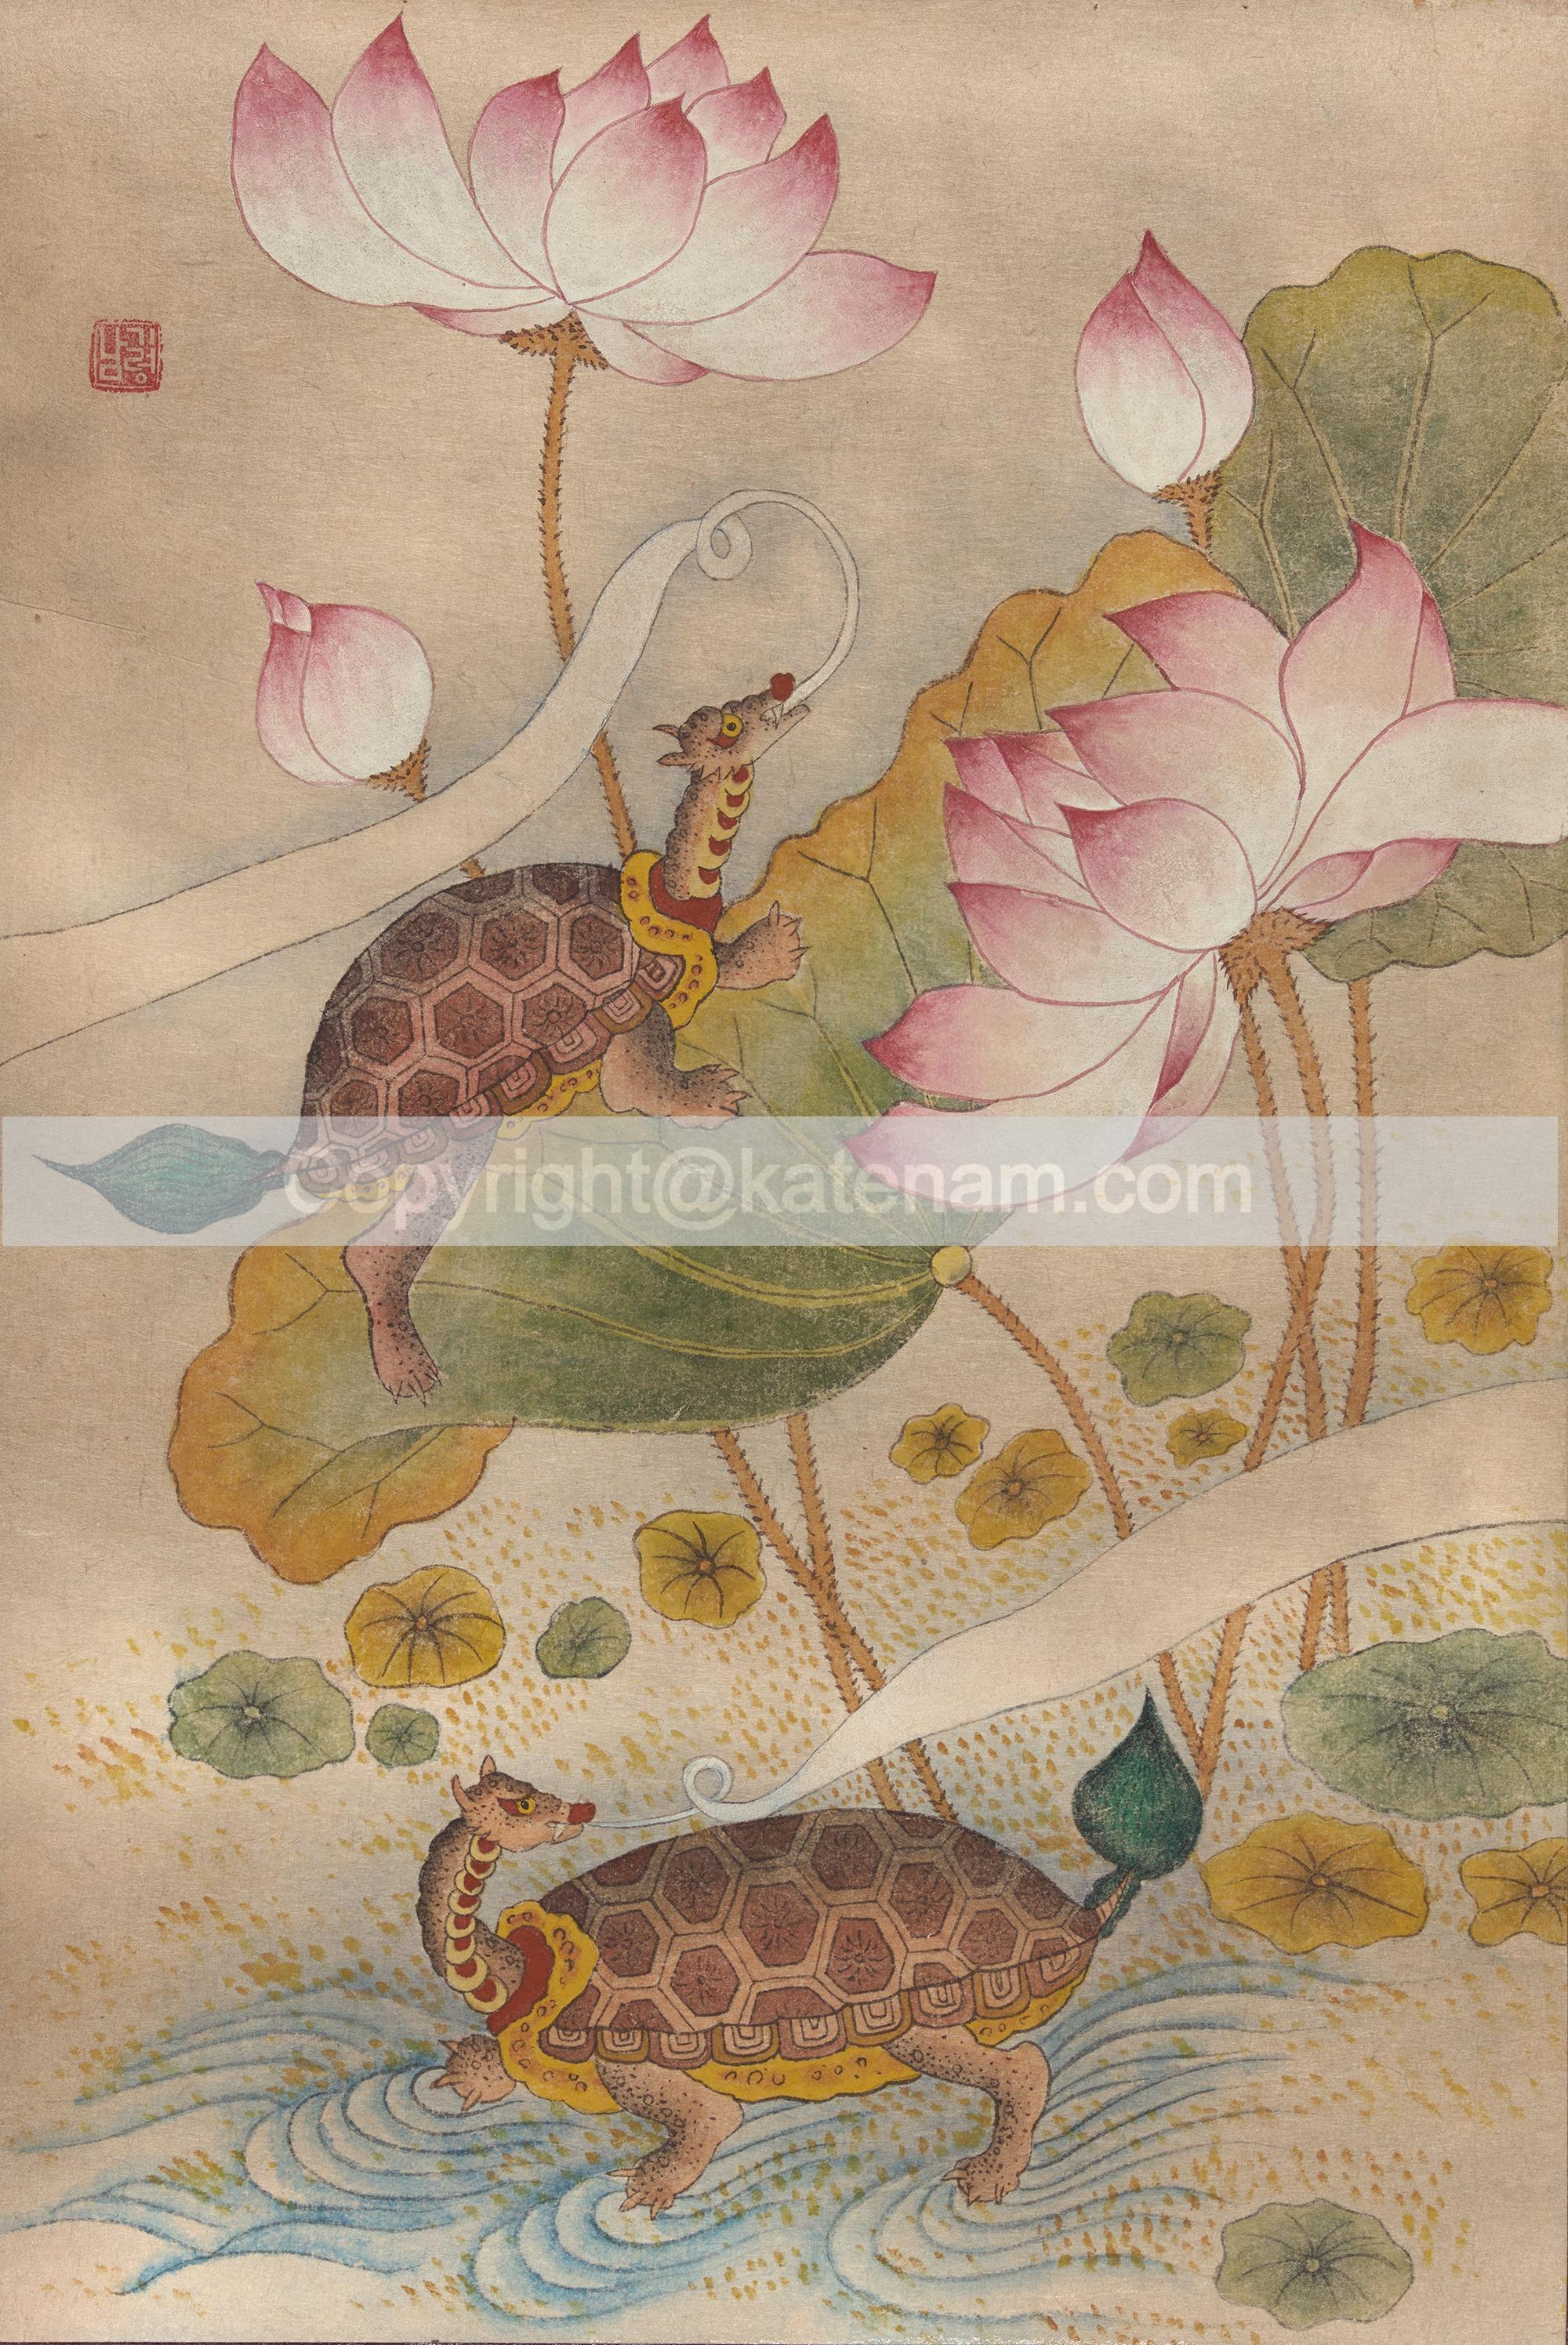 Lotus with turtles (2010)